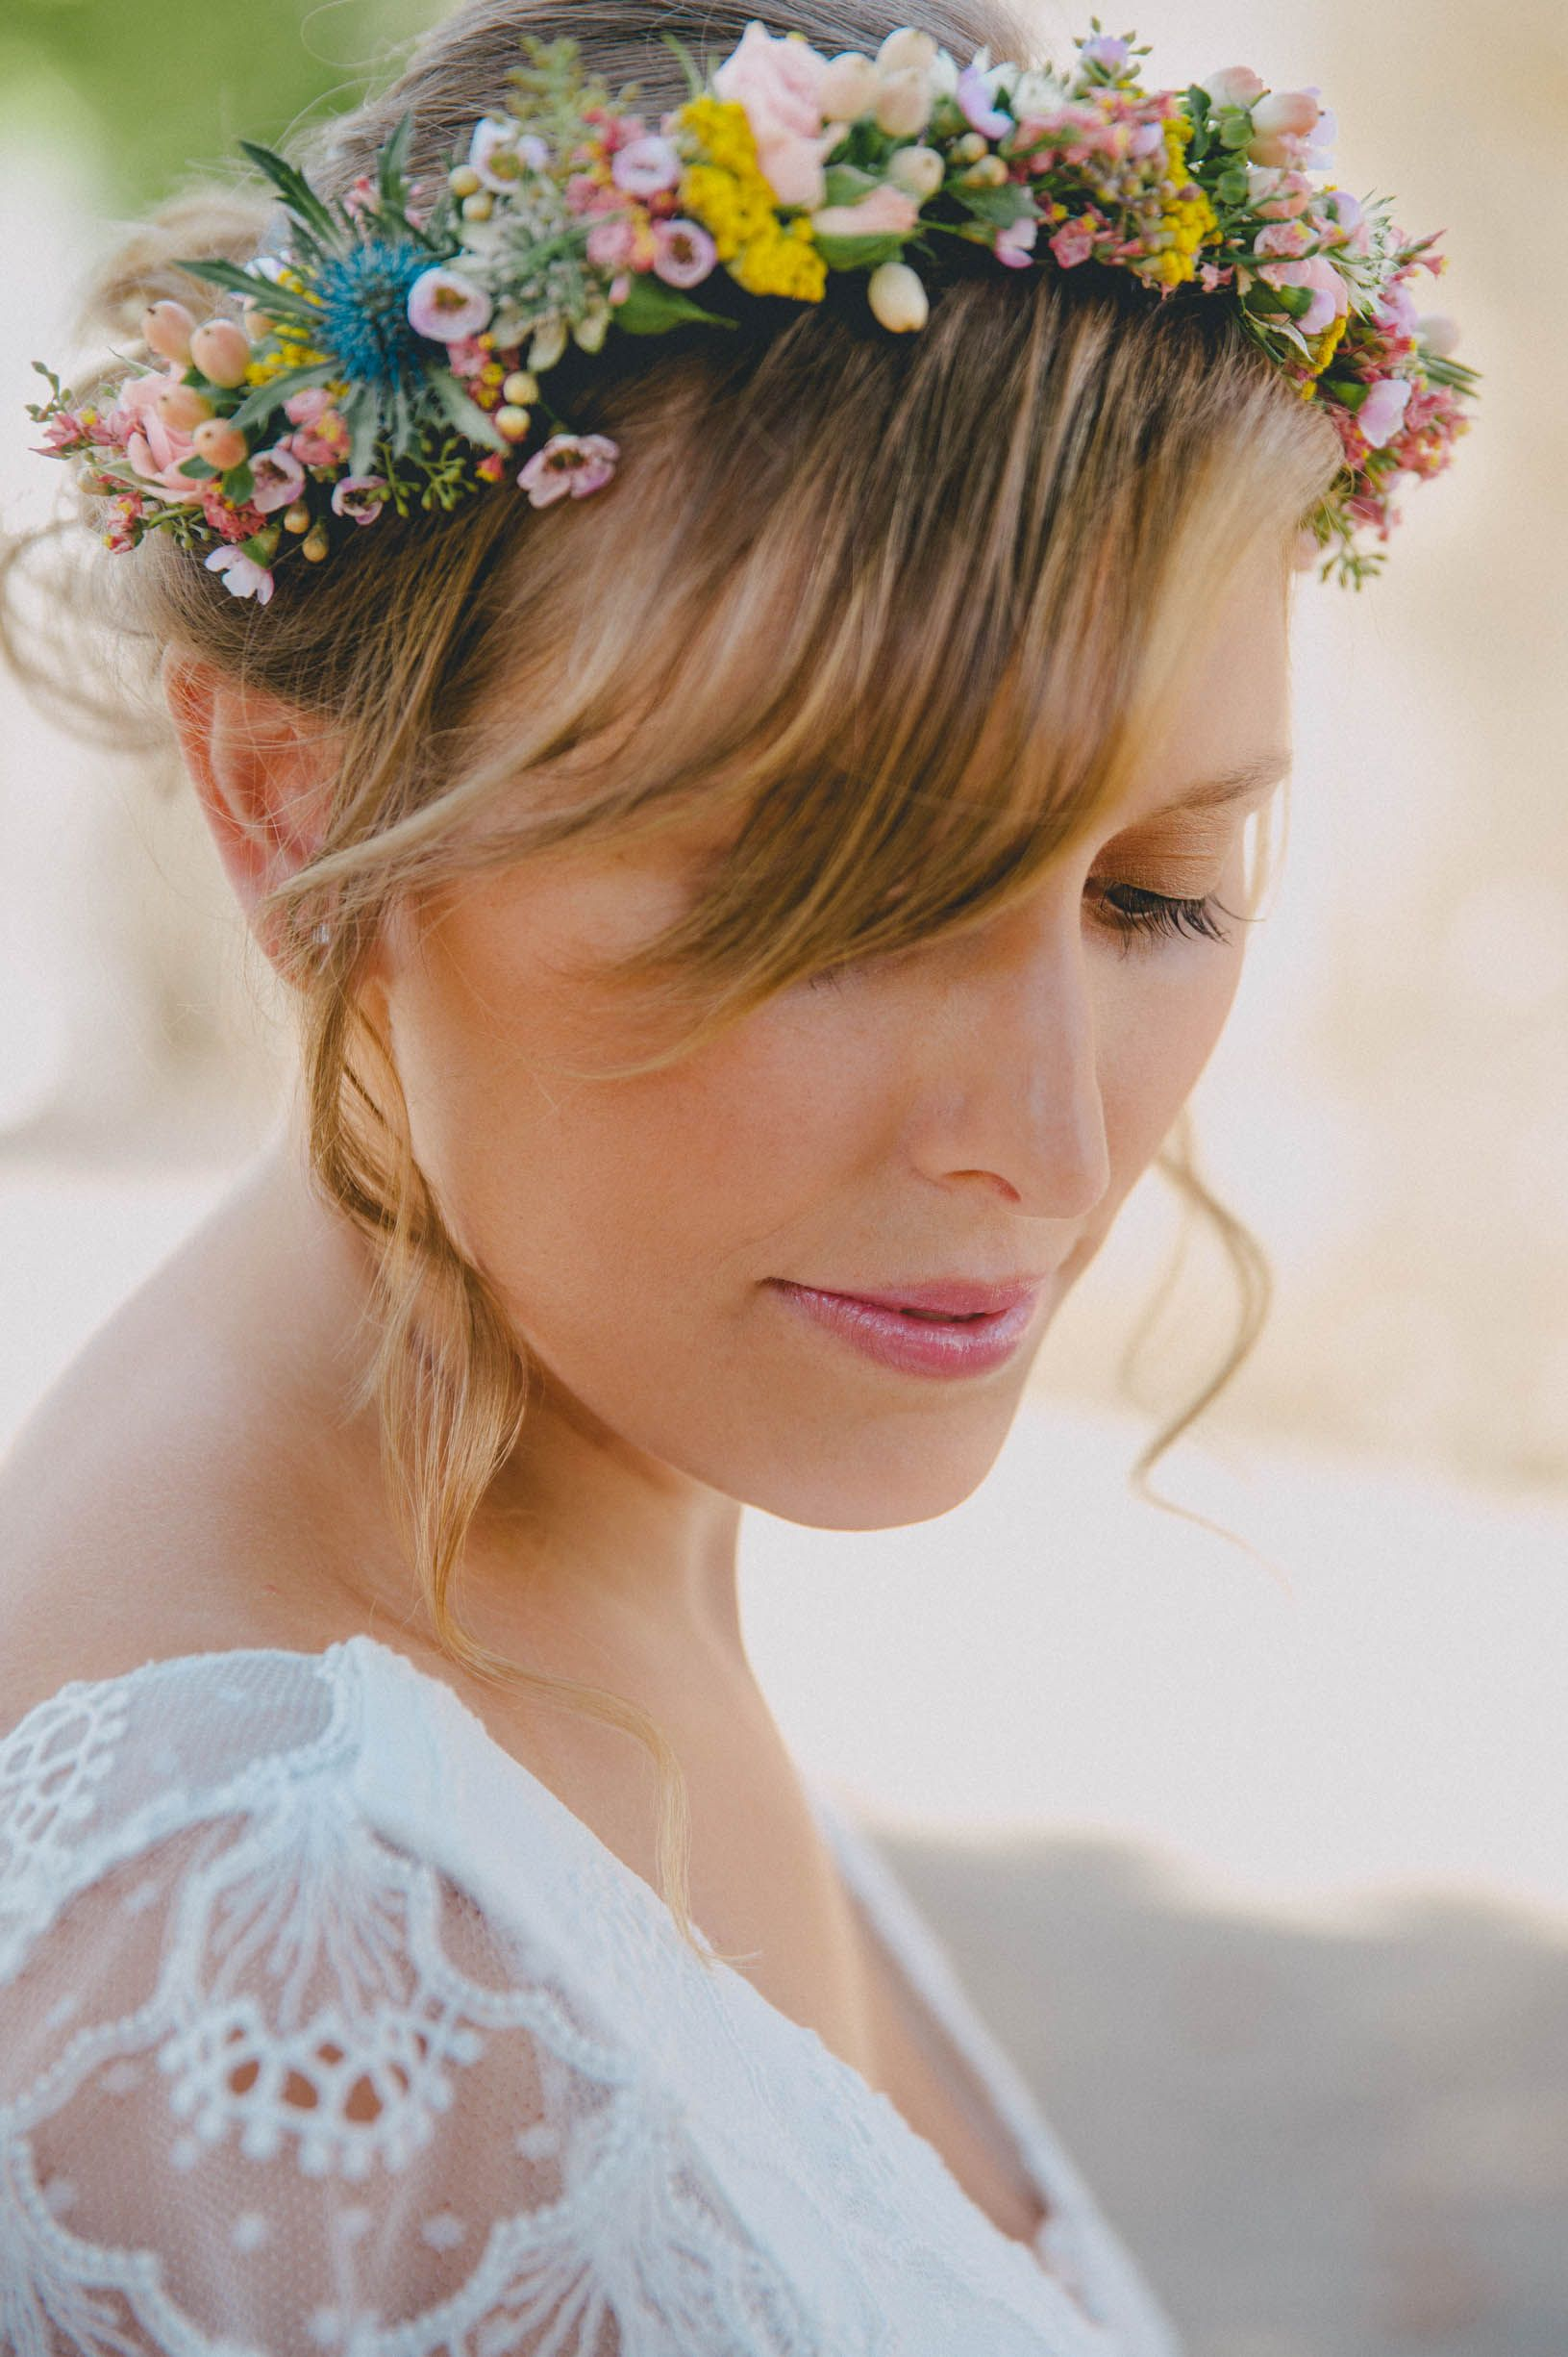 Pin by estelle david on couronnes de fleurs pinterest wedding floral crown wedding spring wedding flowers bridal crown bridal hair crown flower izmirmasajfo